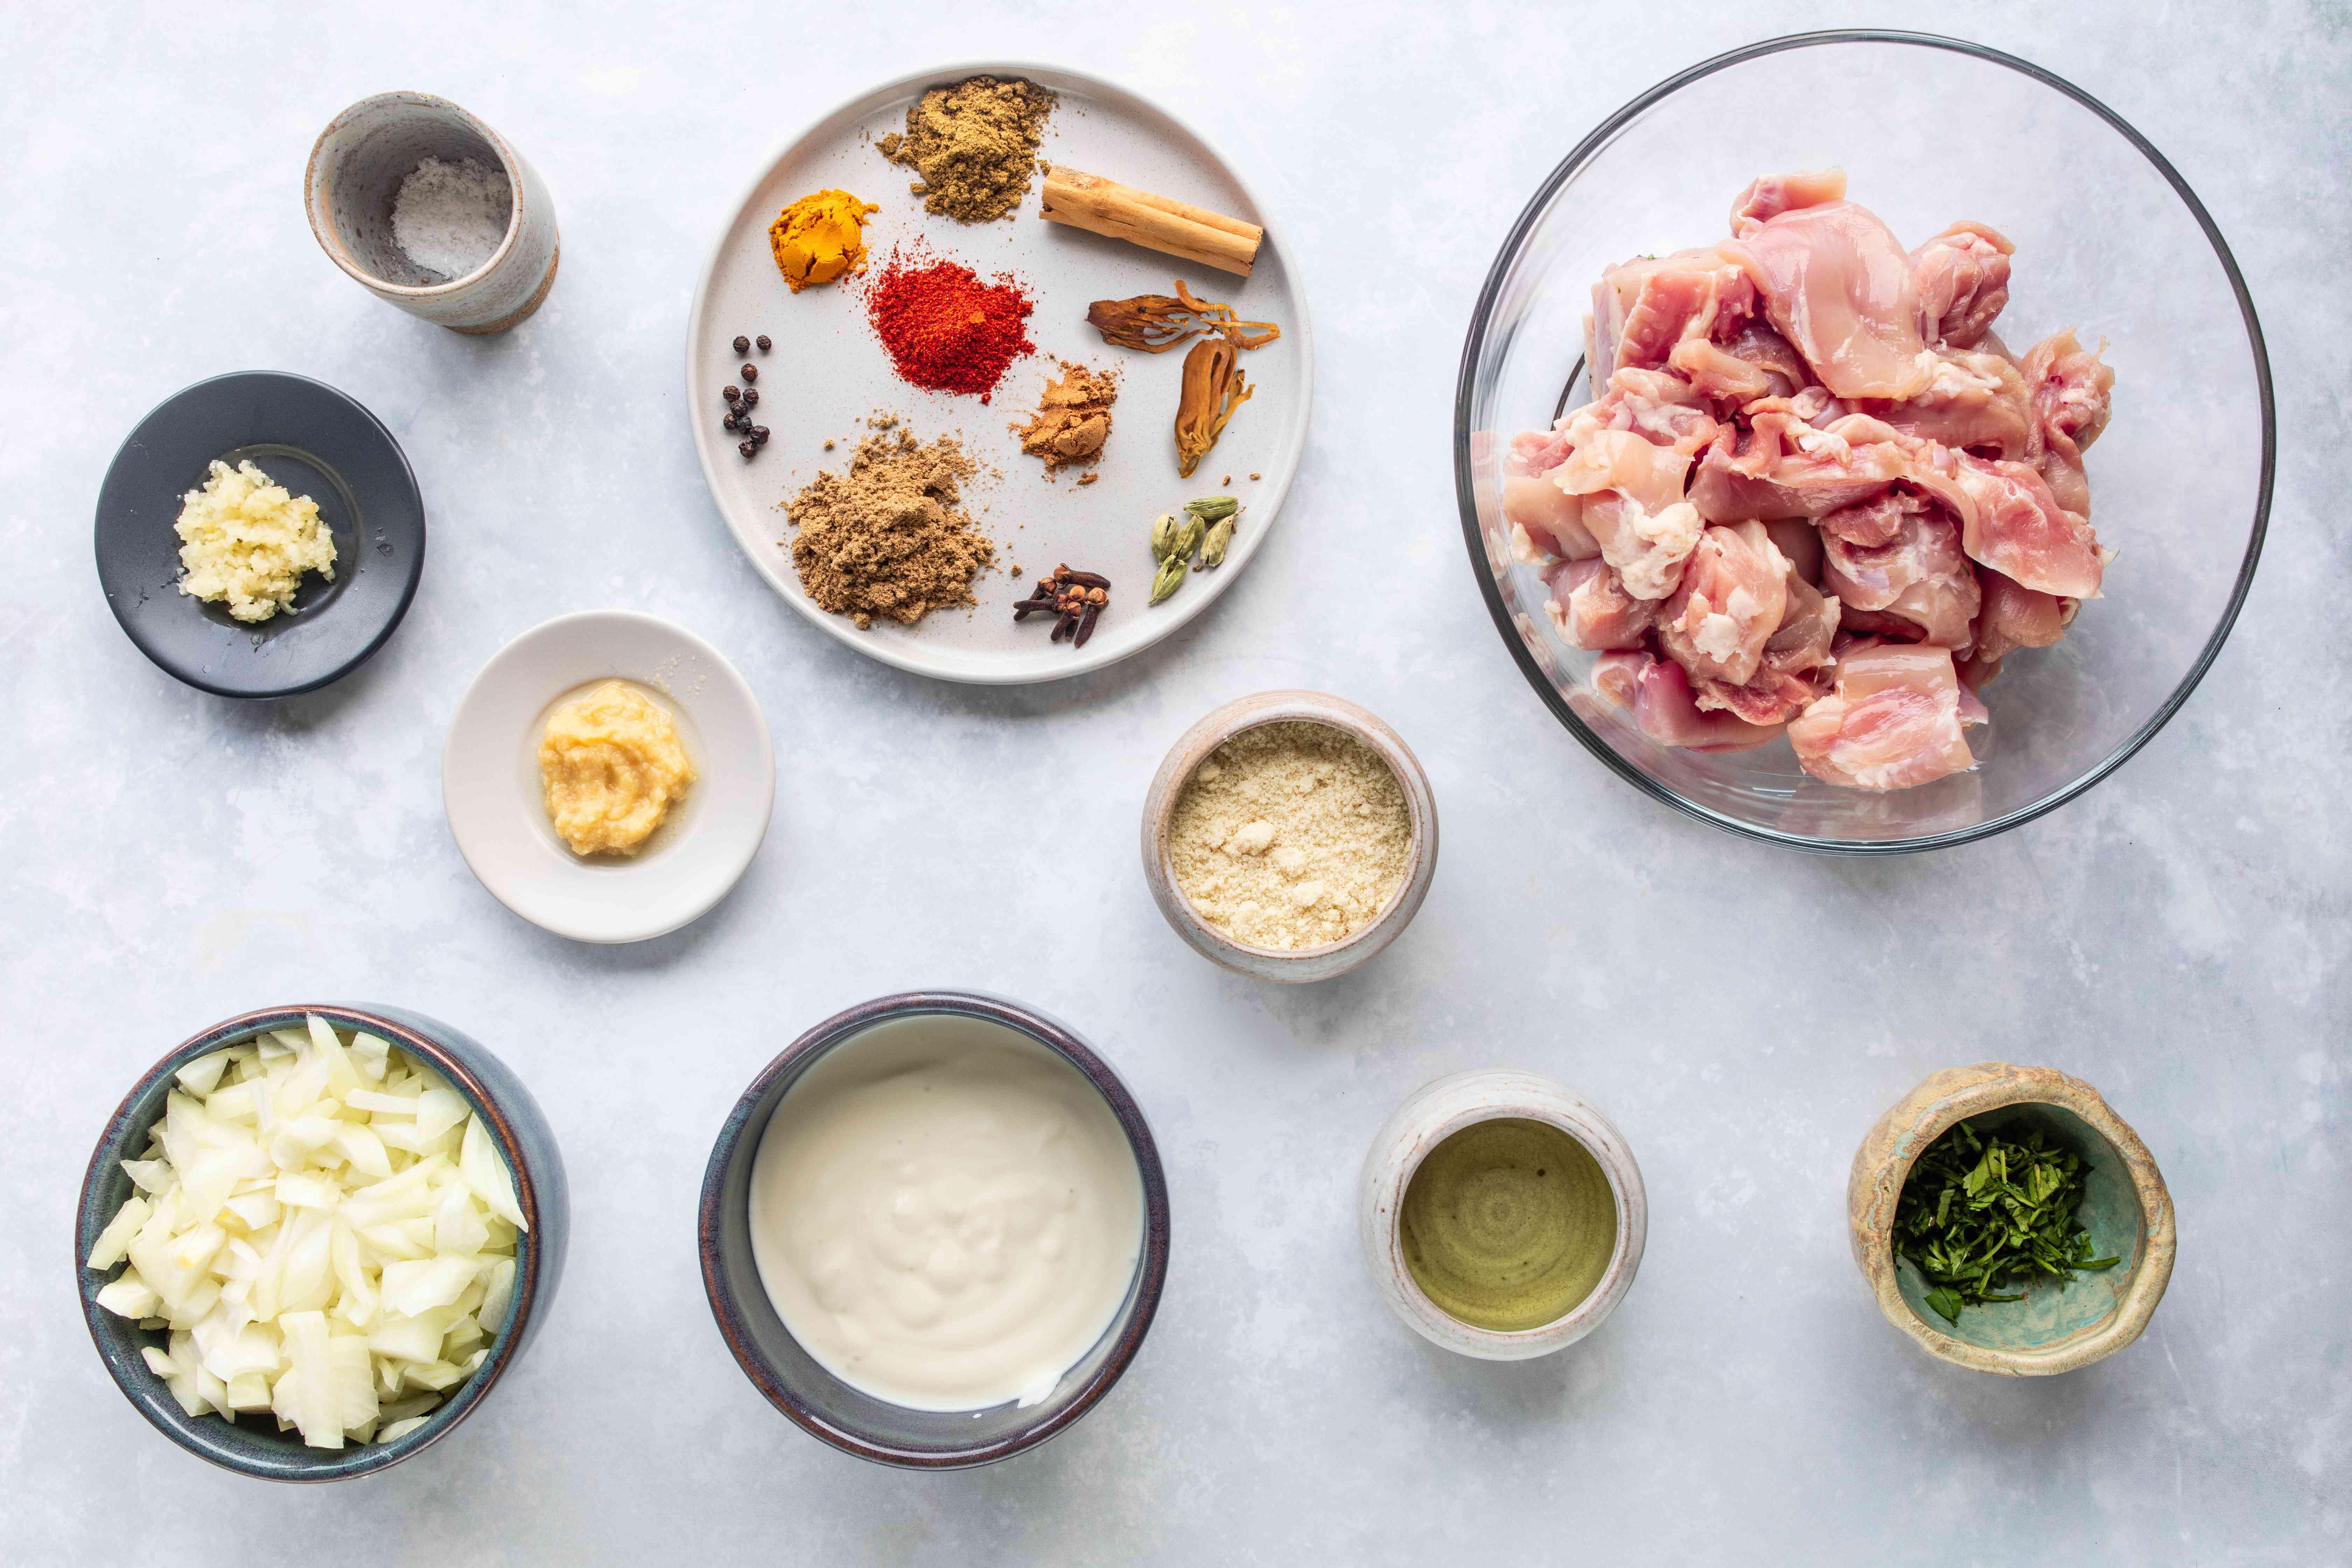 Ingredients for Indian chicken korma